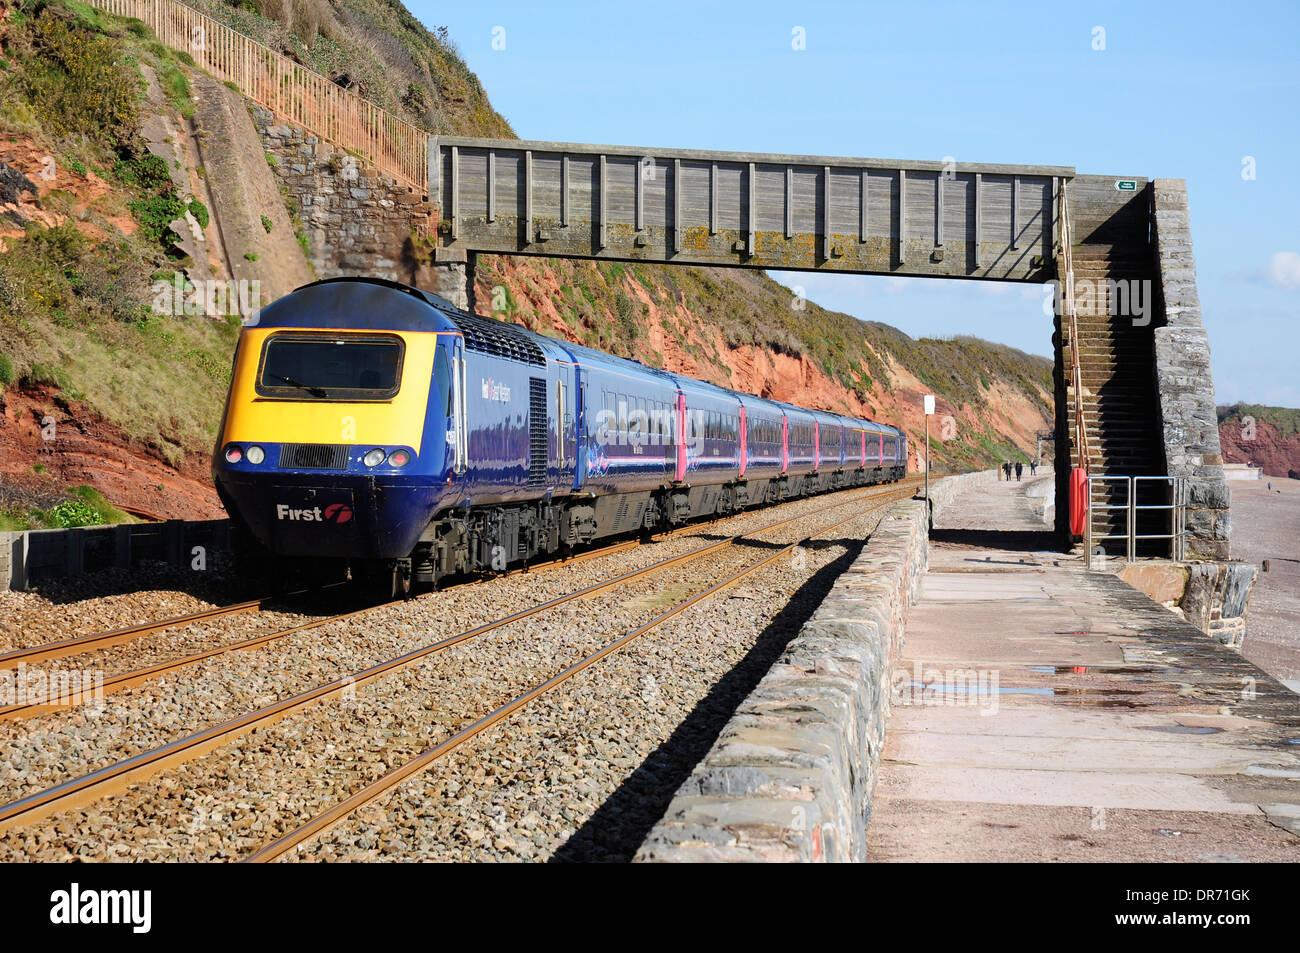 First Great Western class 43 HST by the coastal sea wall near Dawlish, Devon, England, UK - Stock Image